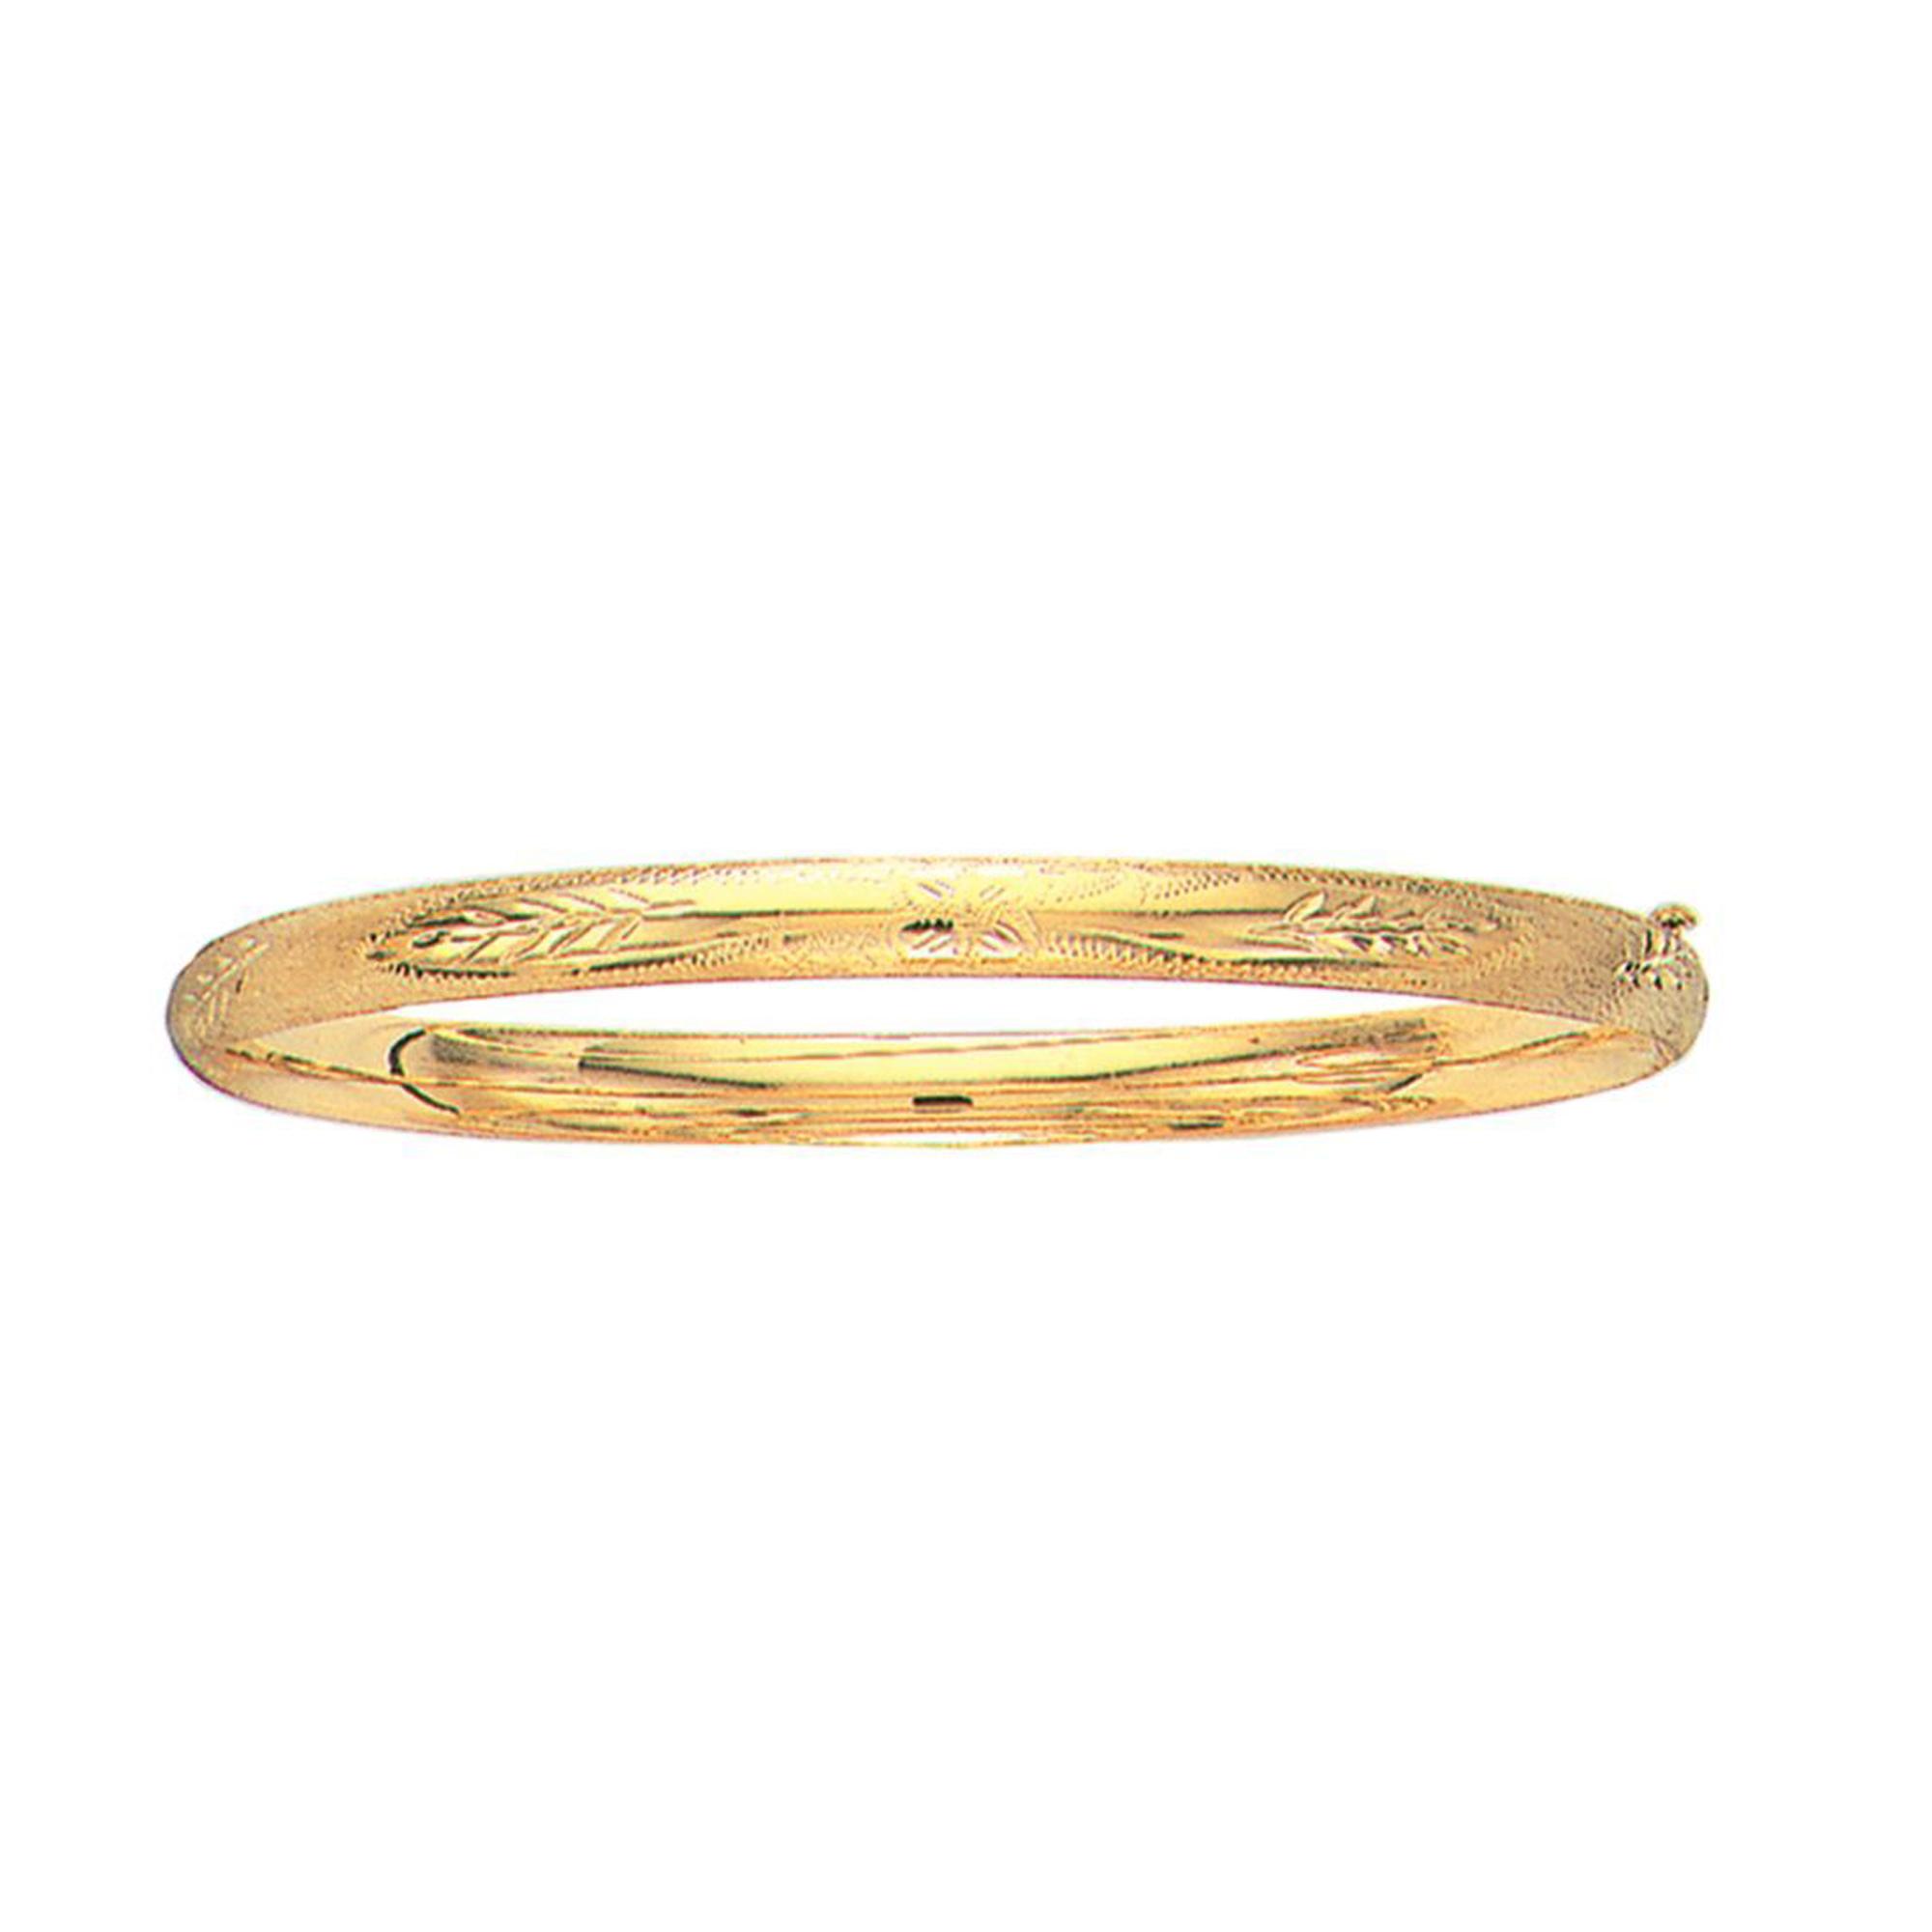 10k Yellow Gold High Polished Dome Florentine Bangle Bracelet, 7″